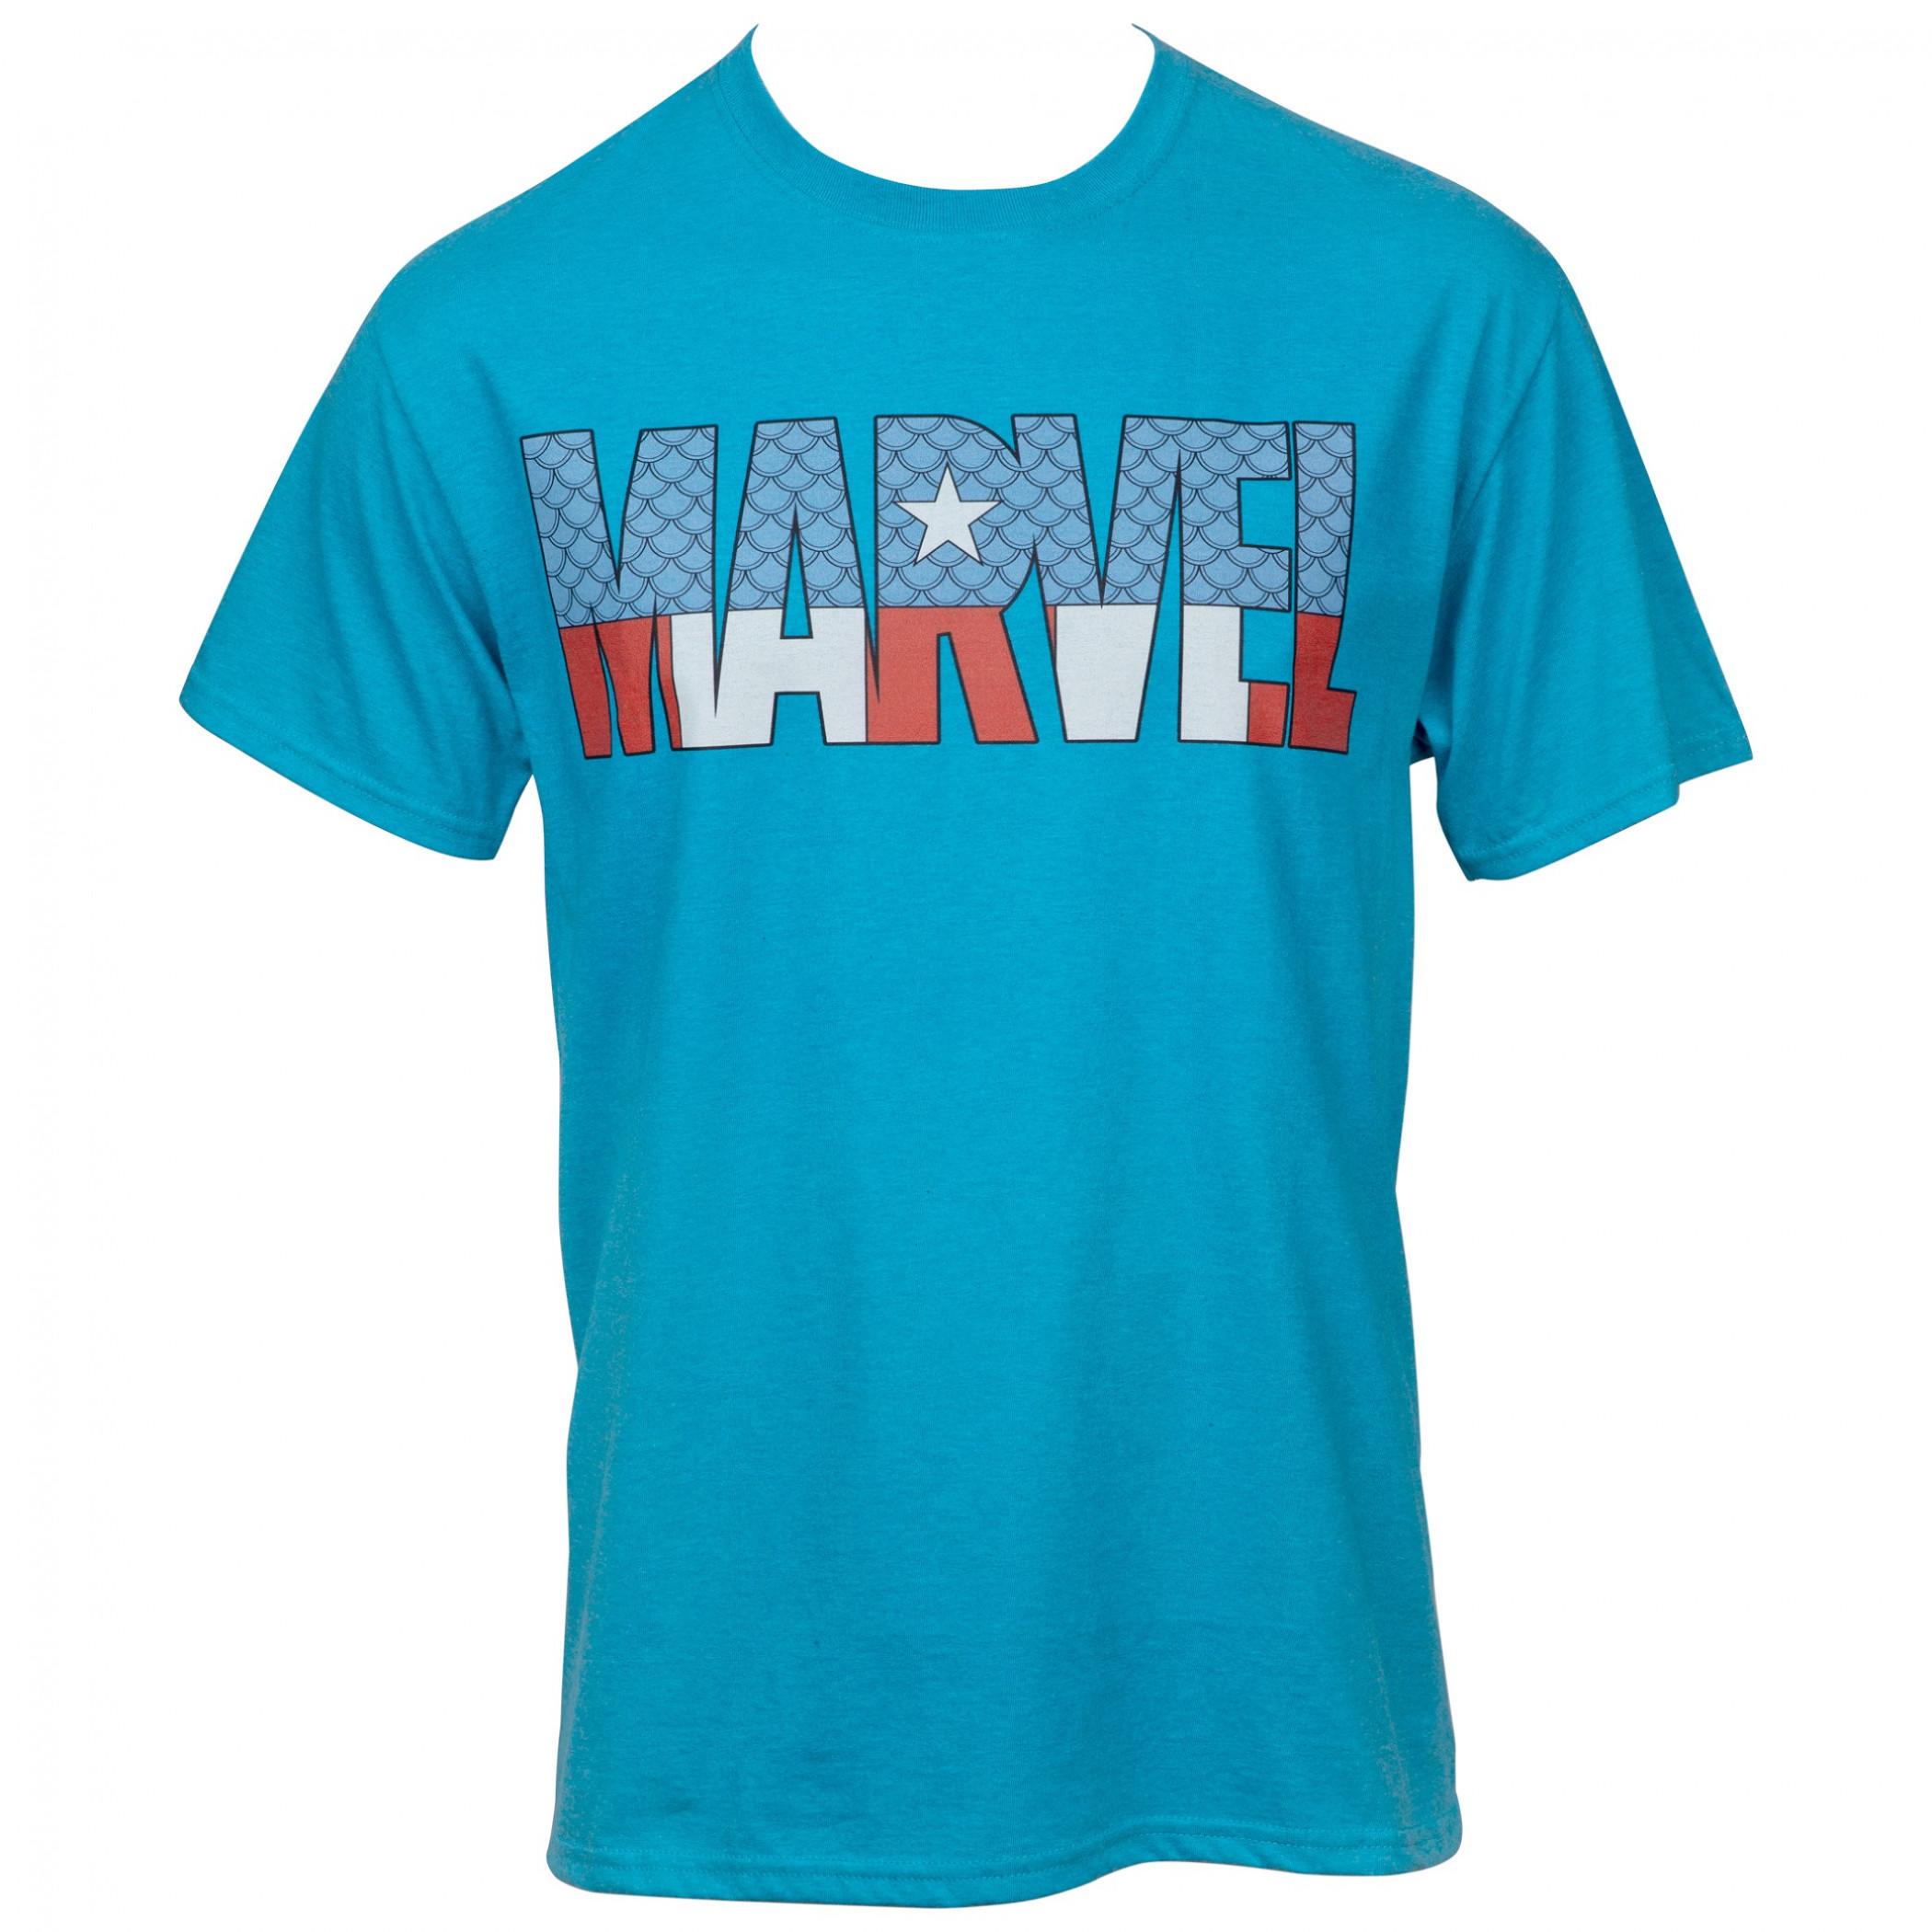 Marvel Comics Text Brand Captain America Themed T-Shirt